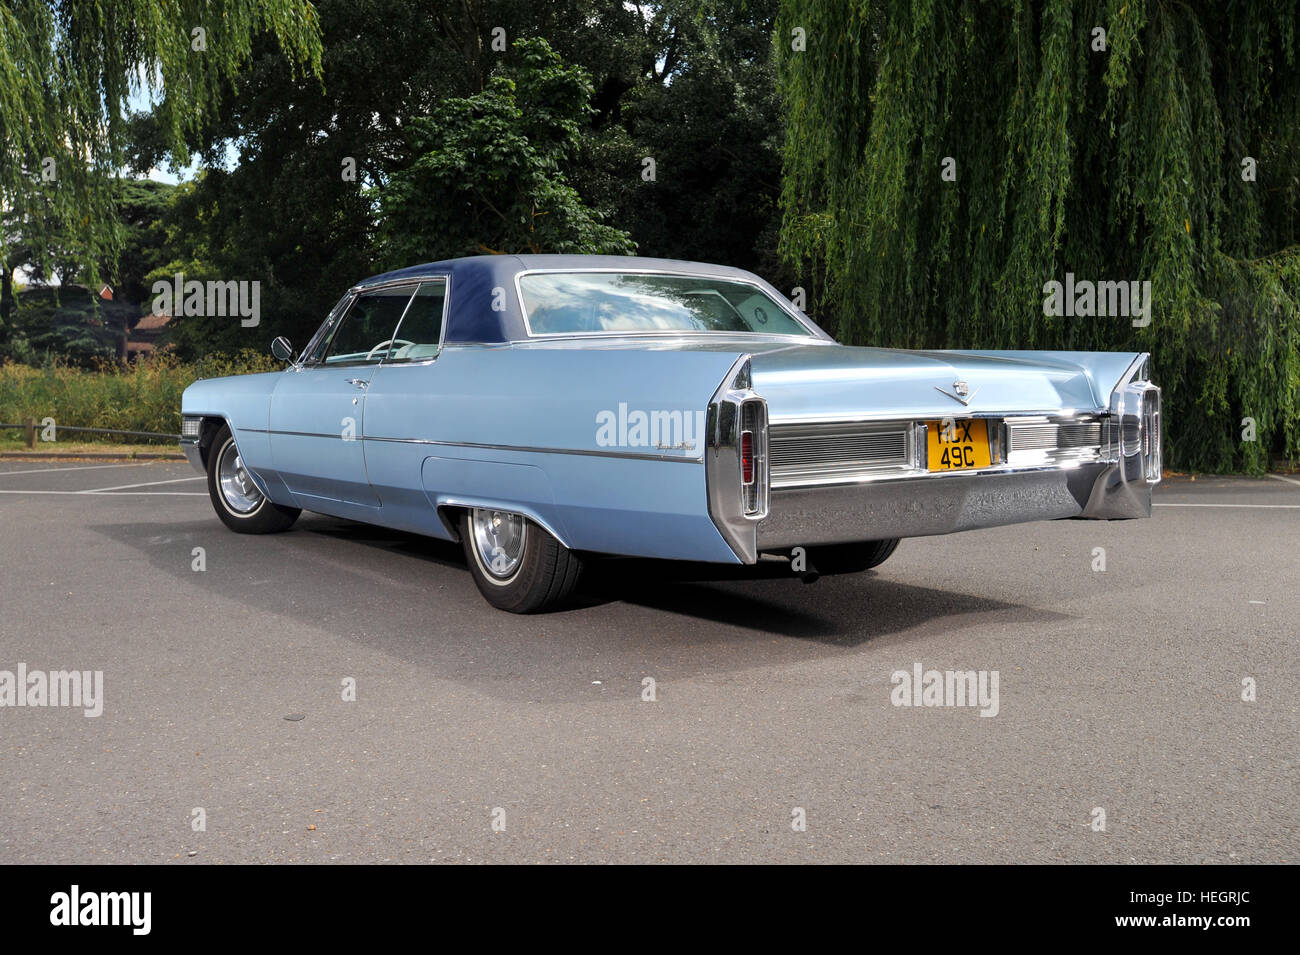 1965 Cadillac Coupe de Ville American luxury 2 door coupe - Stock Image